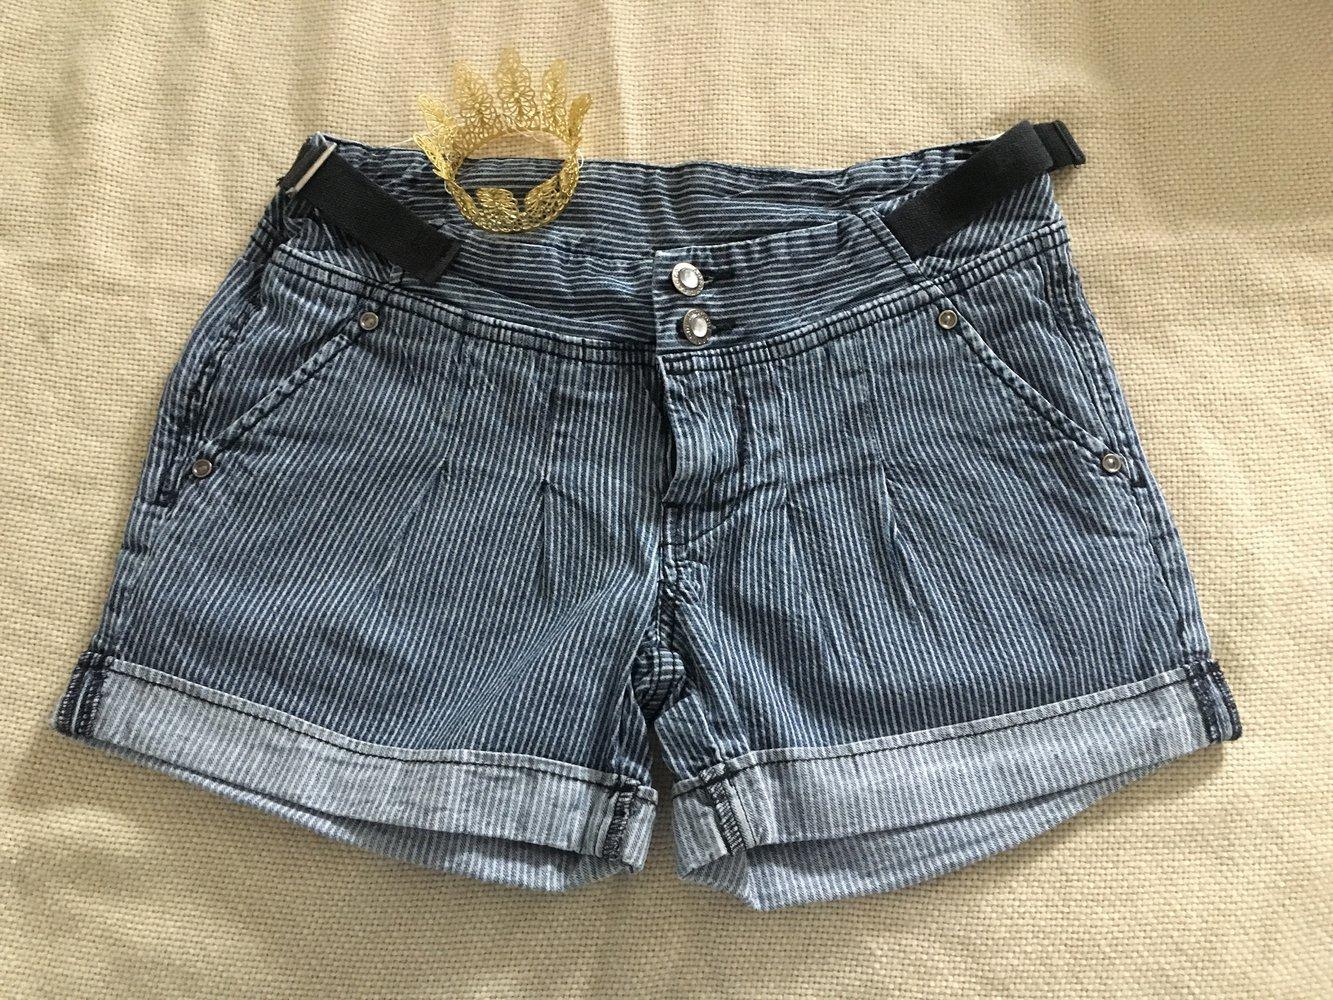 ... Schicke blau grau gestreifte Shorts, Hotpants, Streifen, kurze Hose . b3b6c09ede